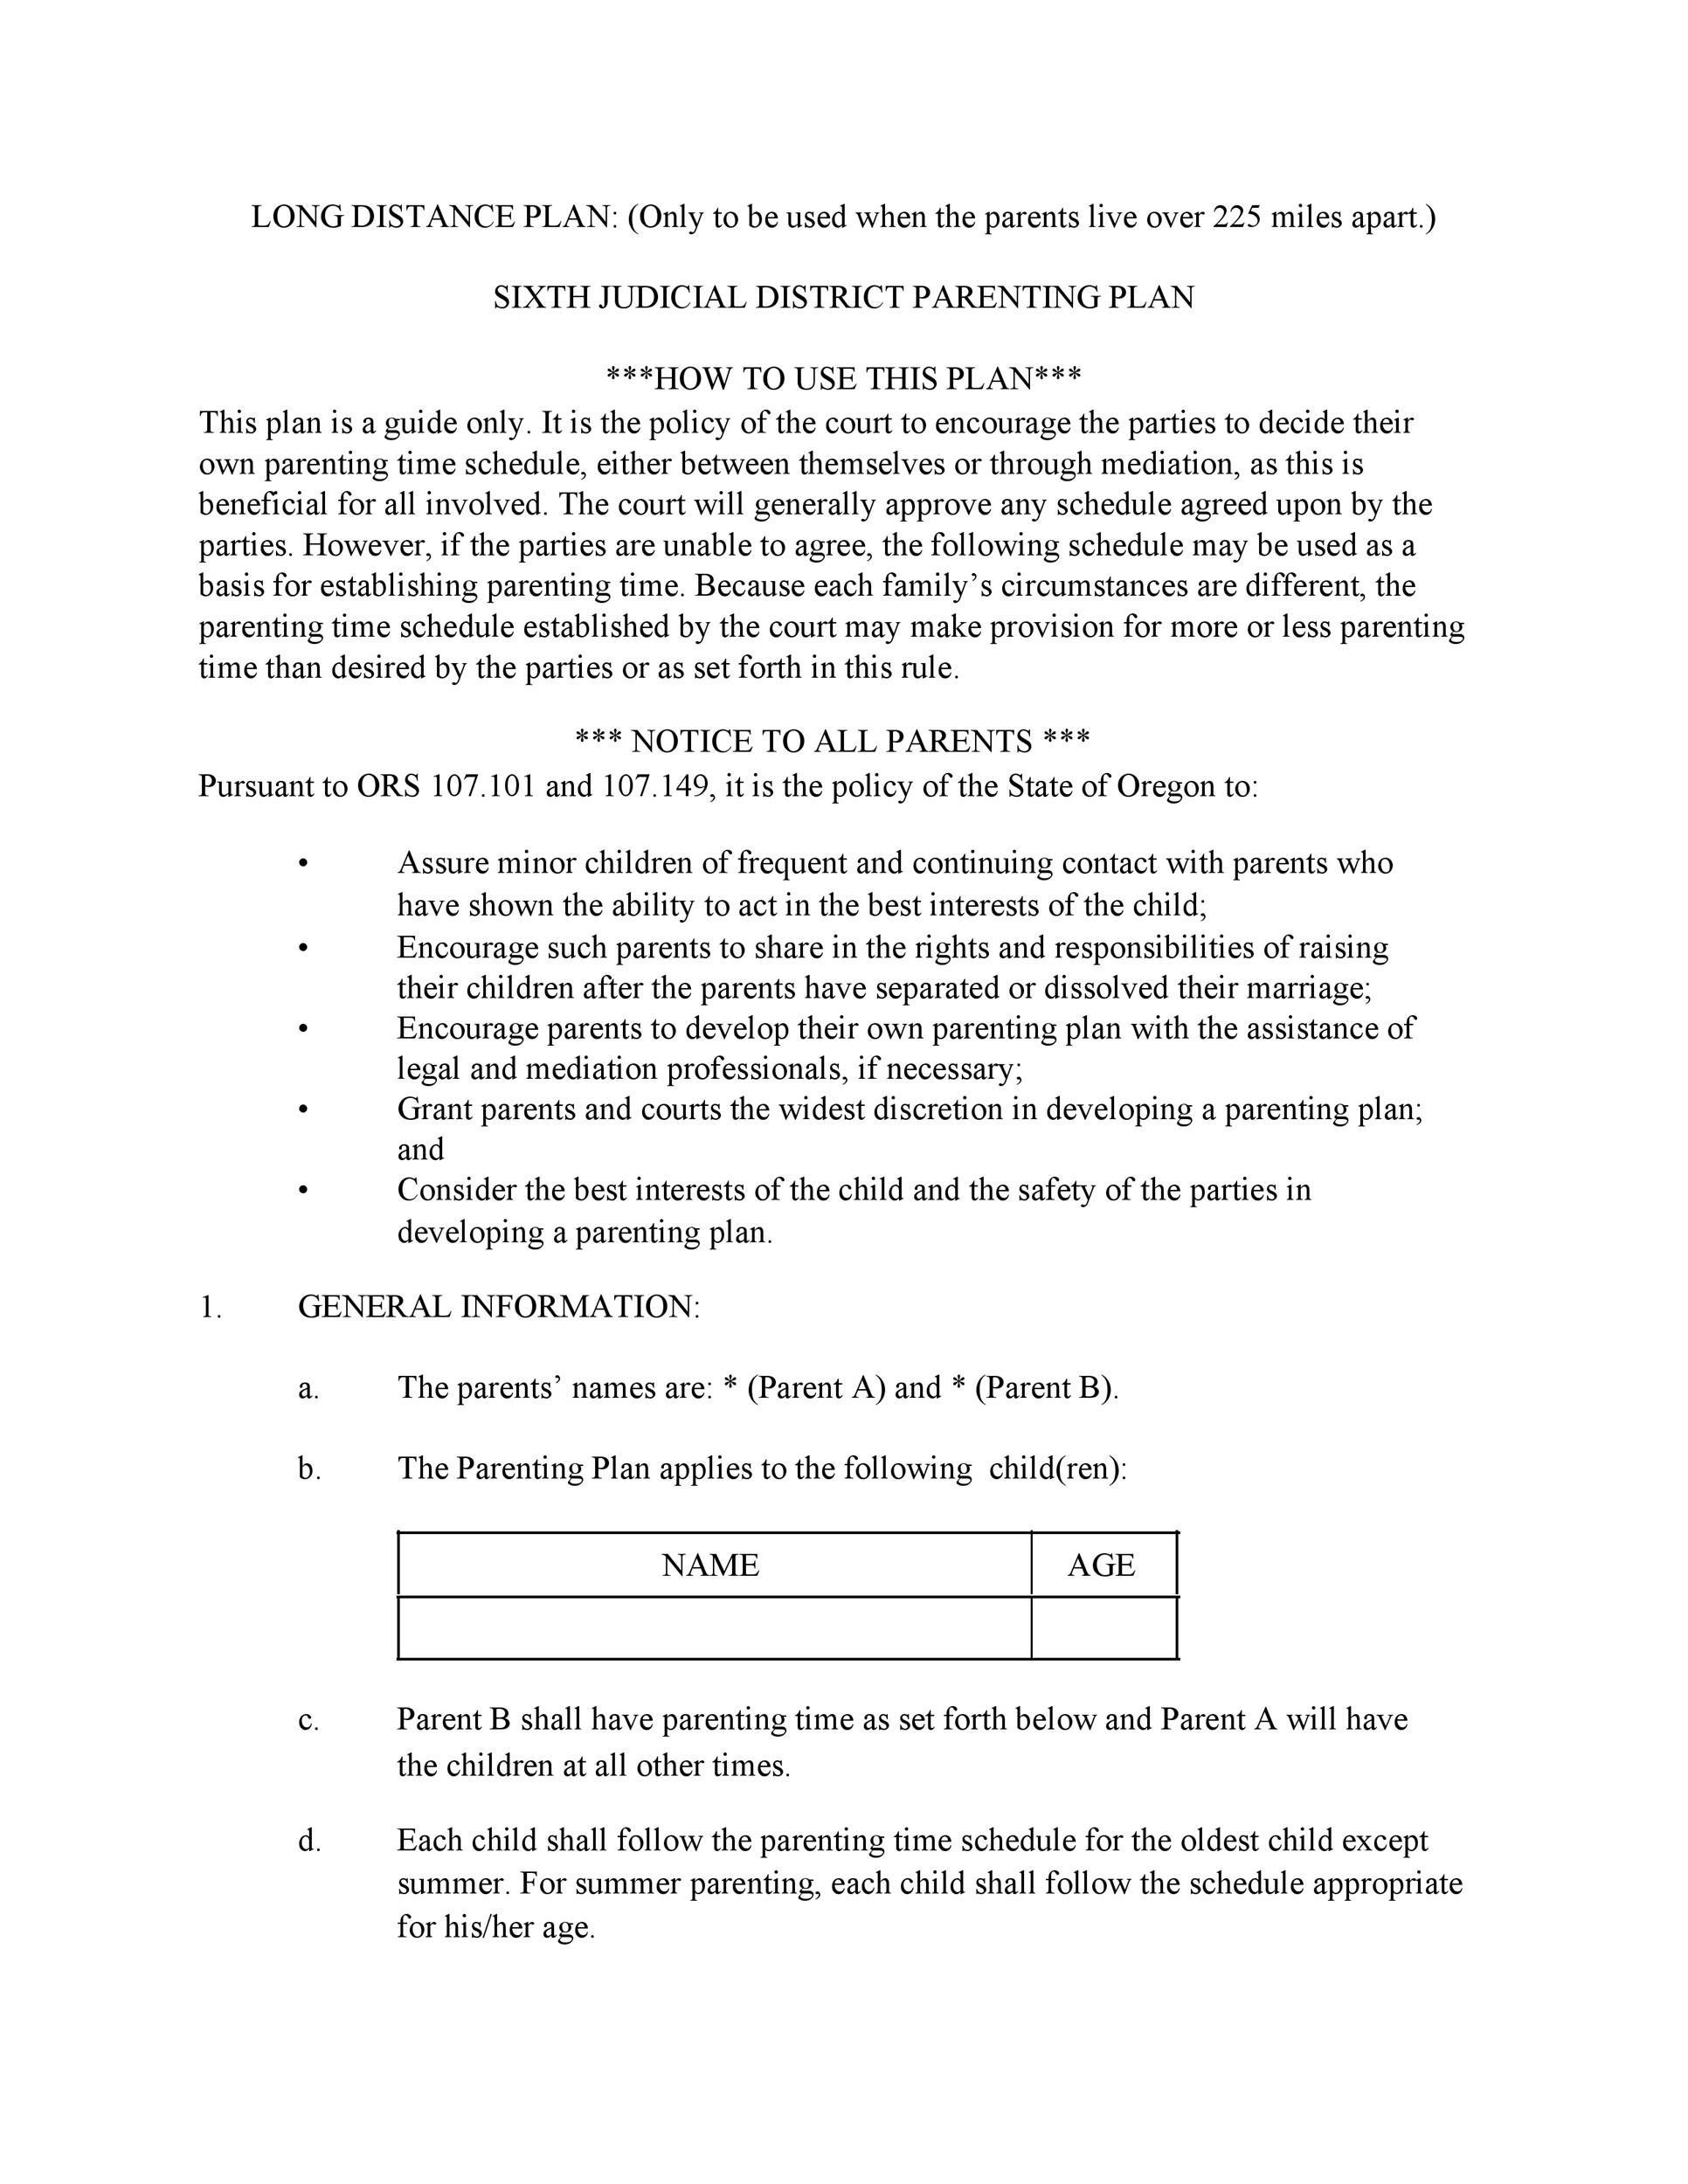 Free parenting plan template 19